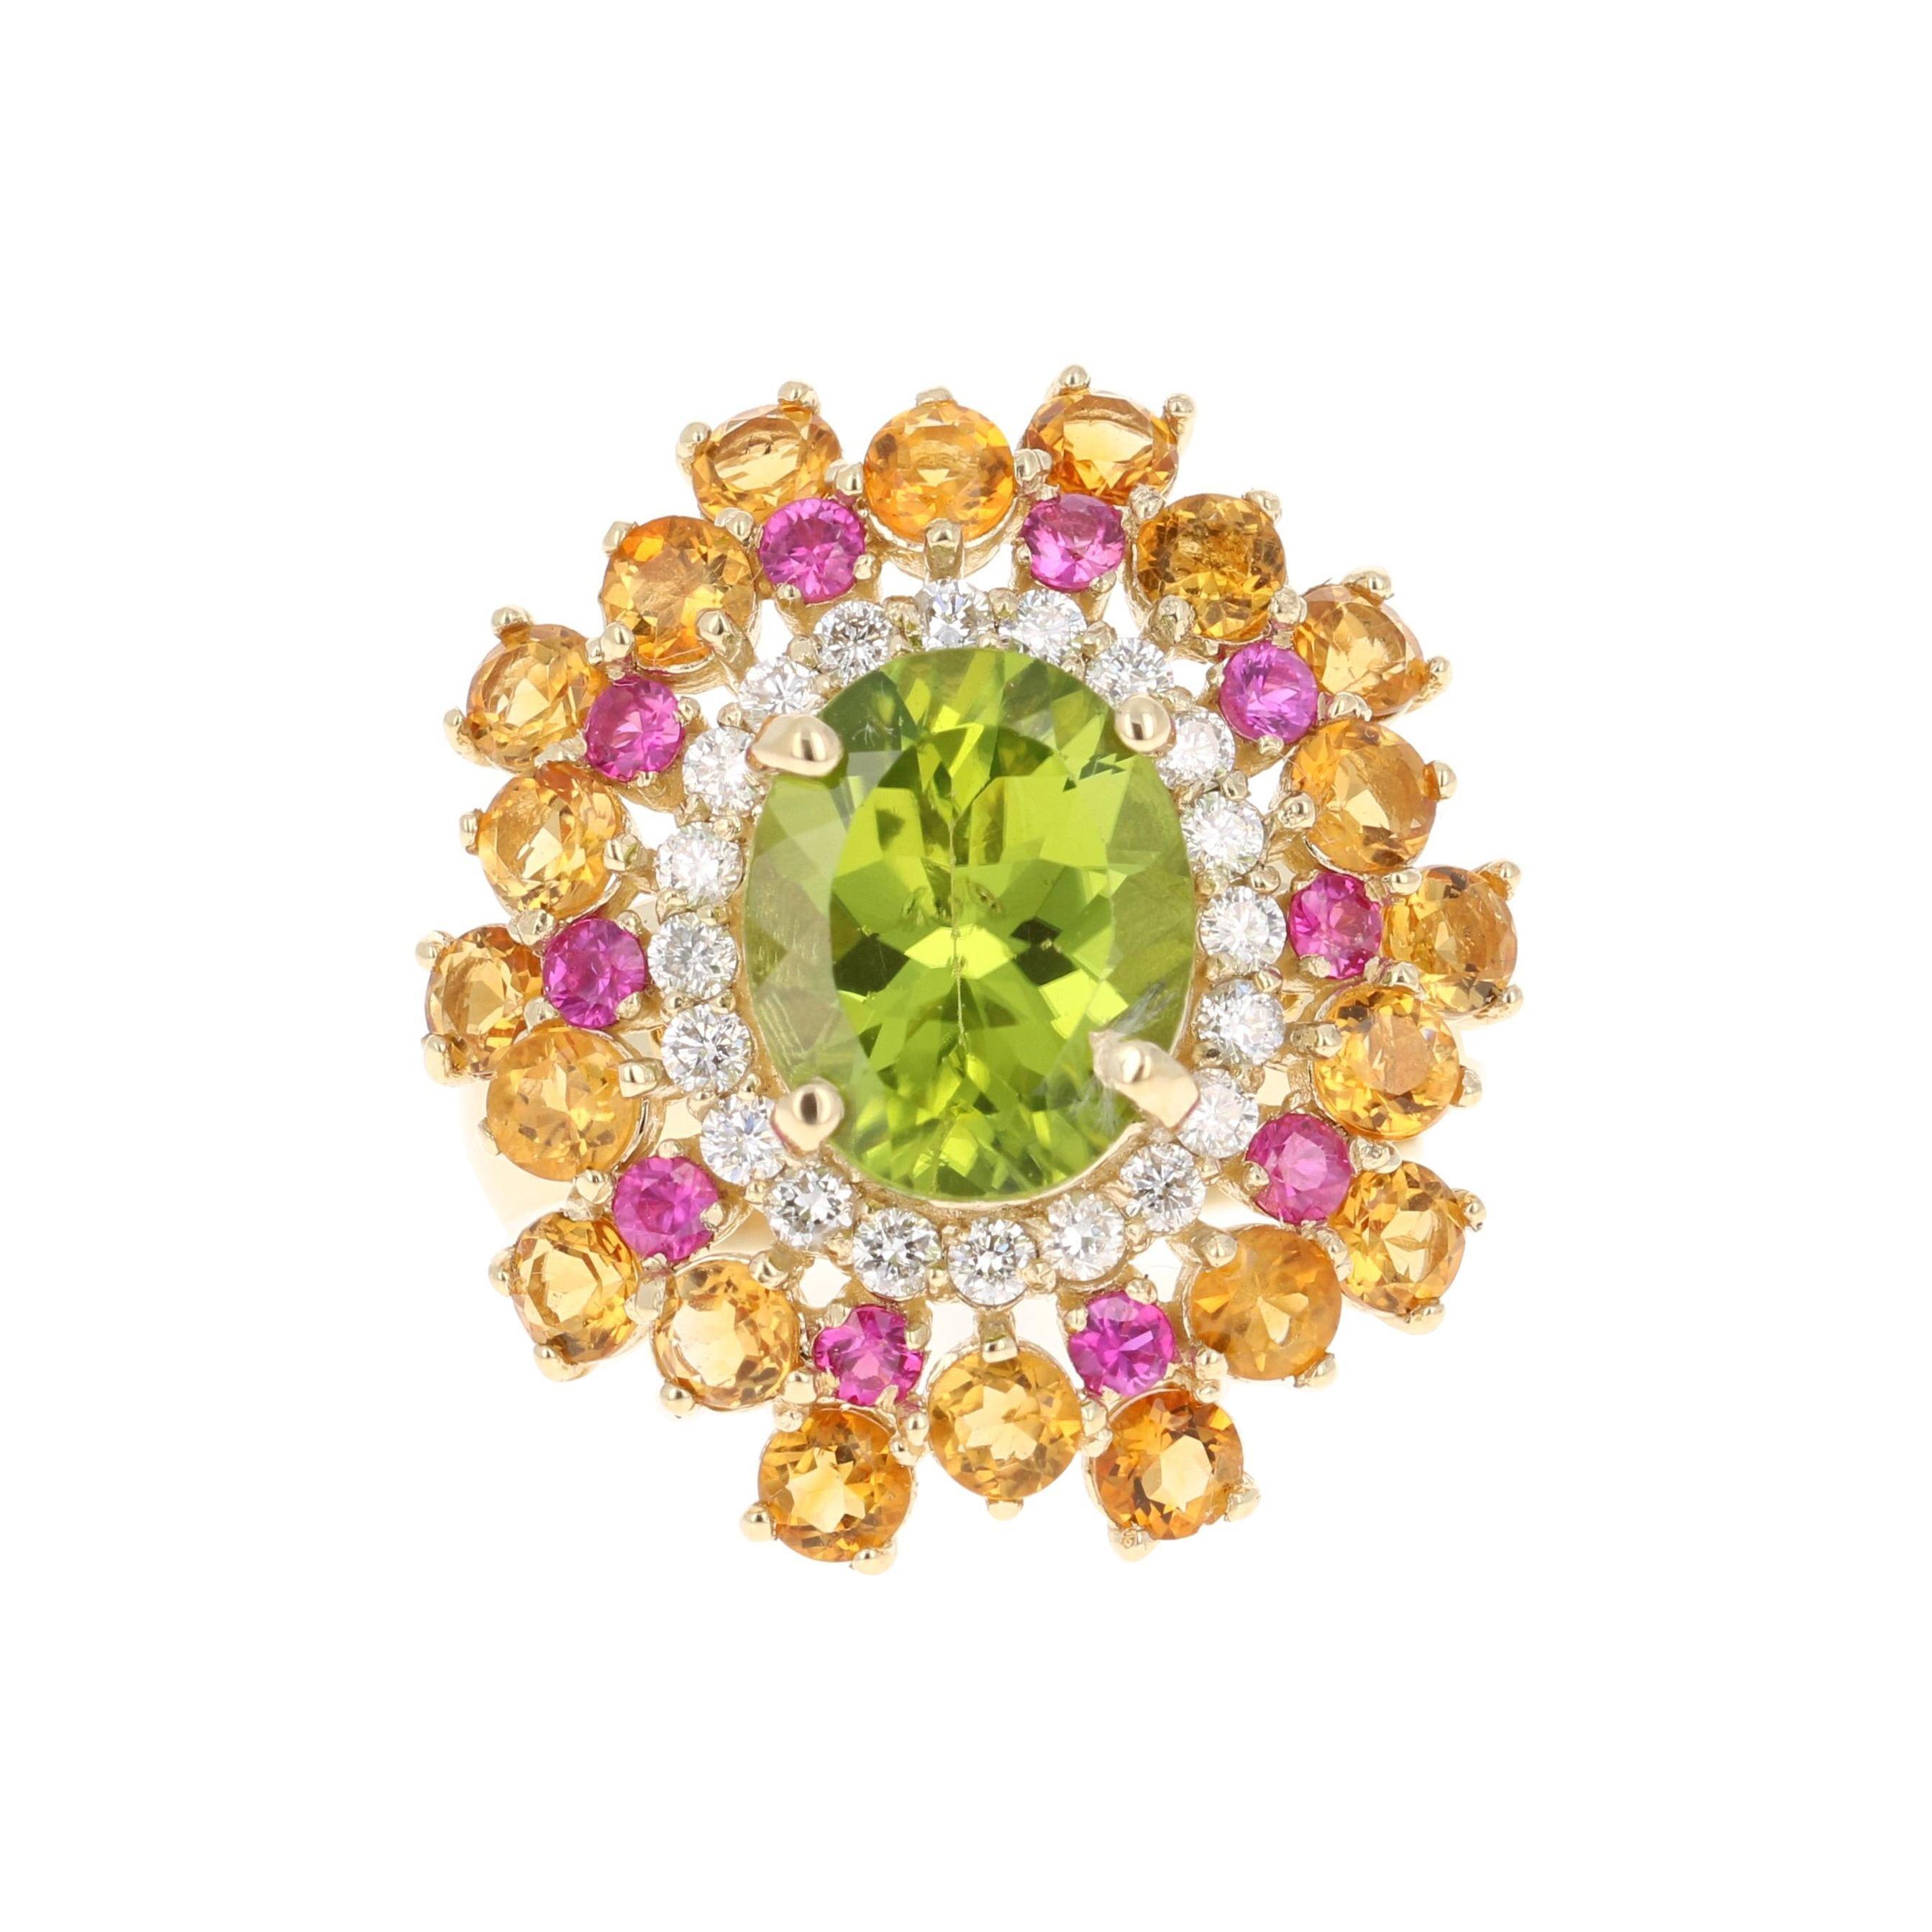 6.15 Carat Peridot Pink, Yellow Sapphire Diamond 14K Yellow Gold Cocktail Ring